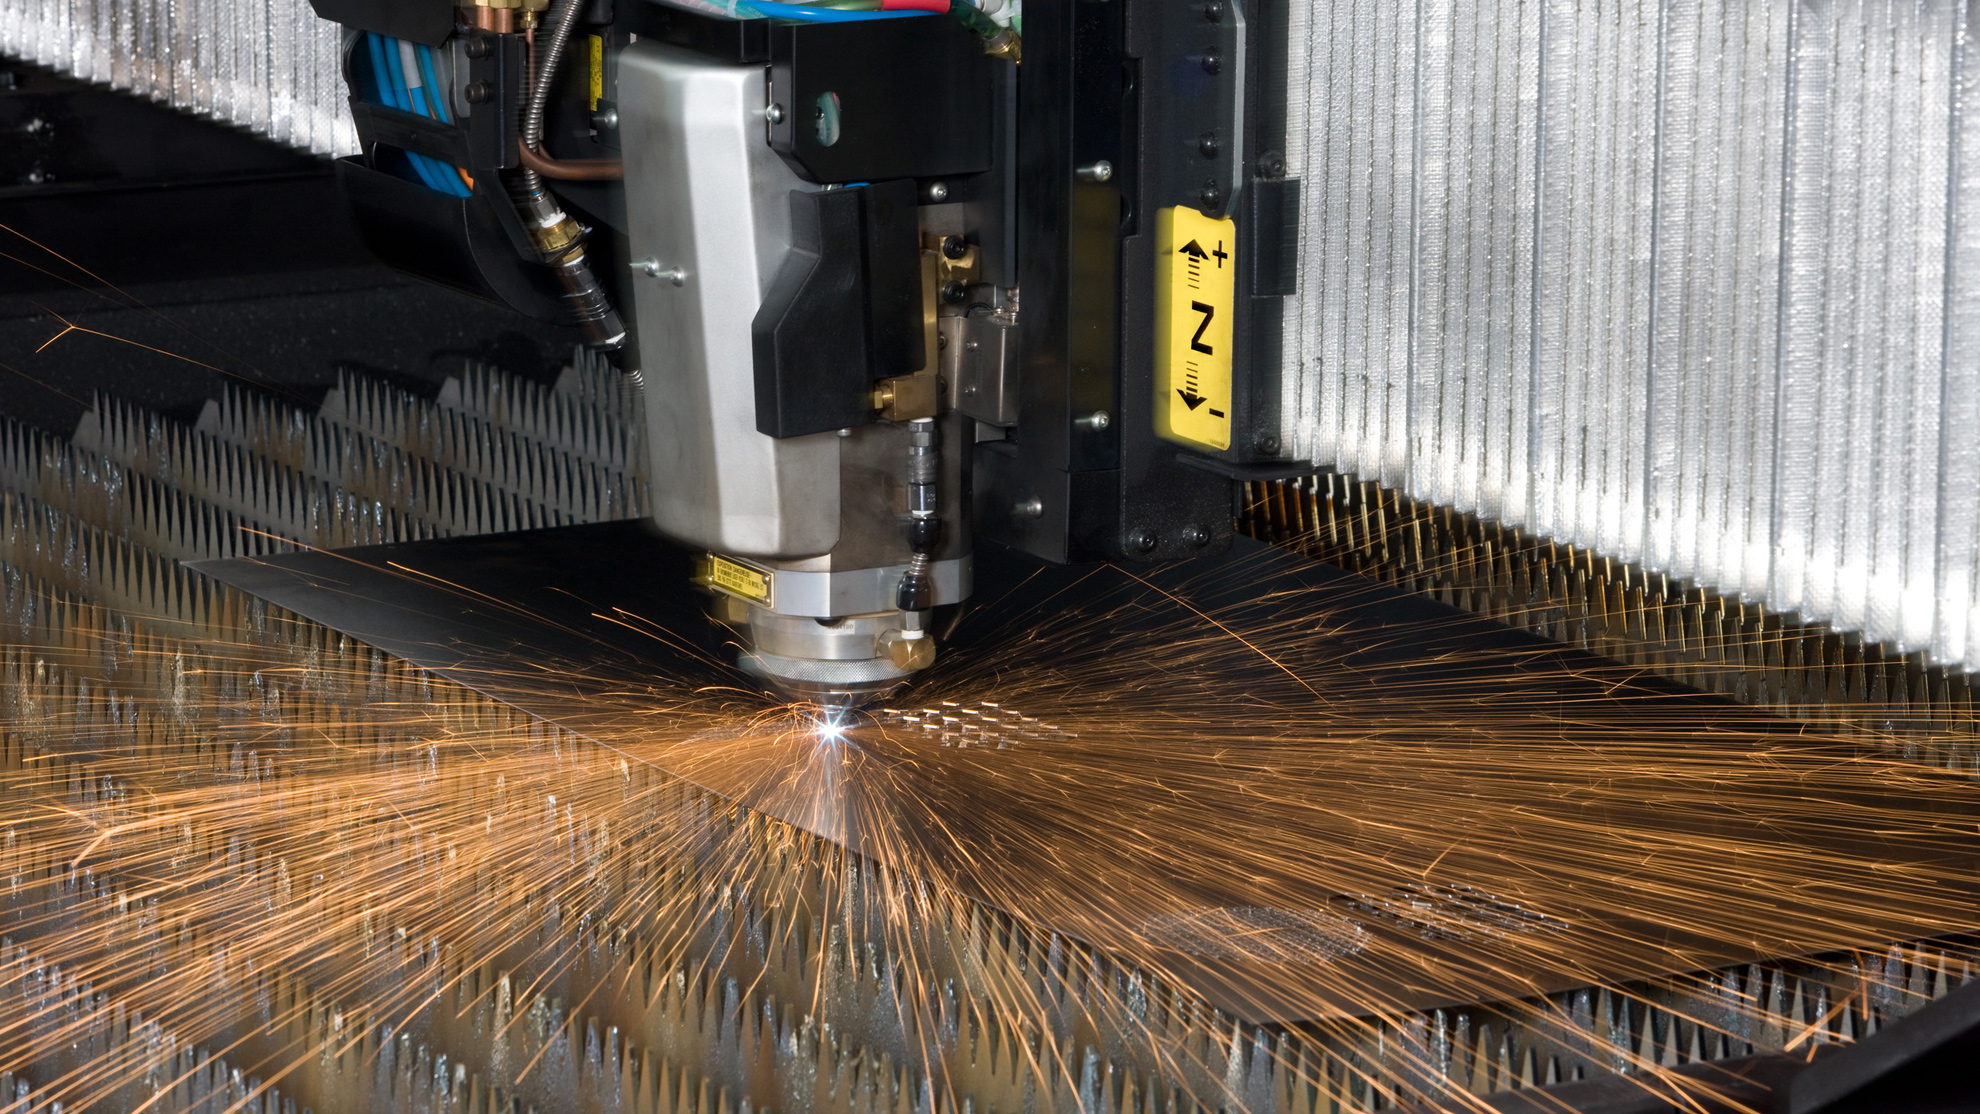 Laser chiller service maintenance and repair showing laser head and molten metal splash